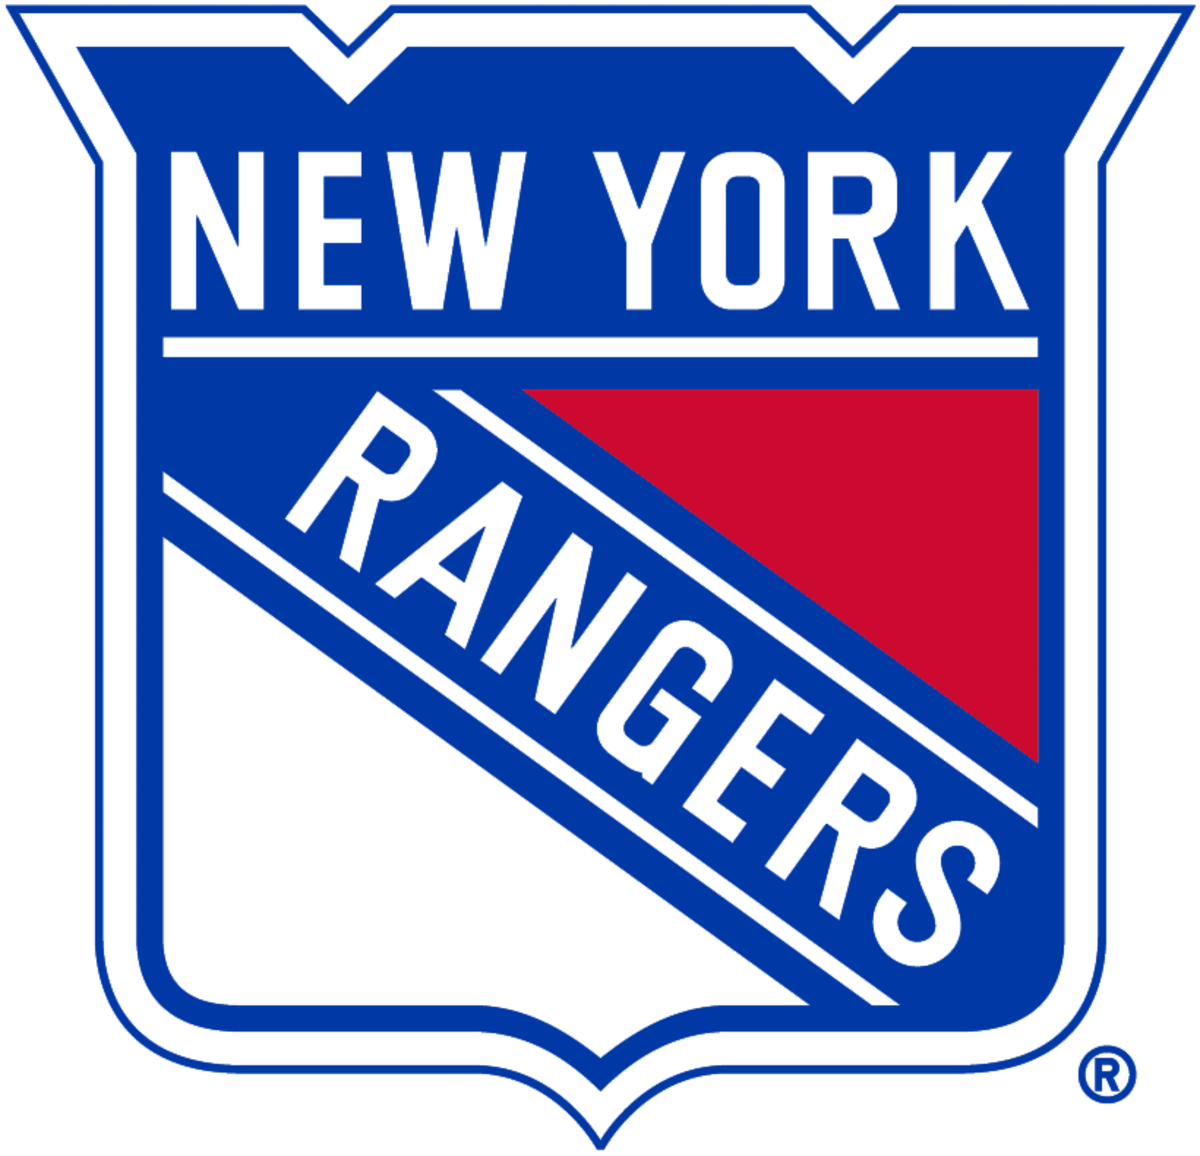 Top 5 Rangers Who Need Breakout Seasons